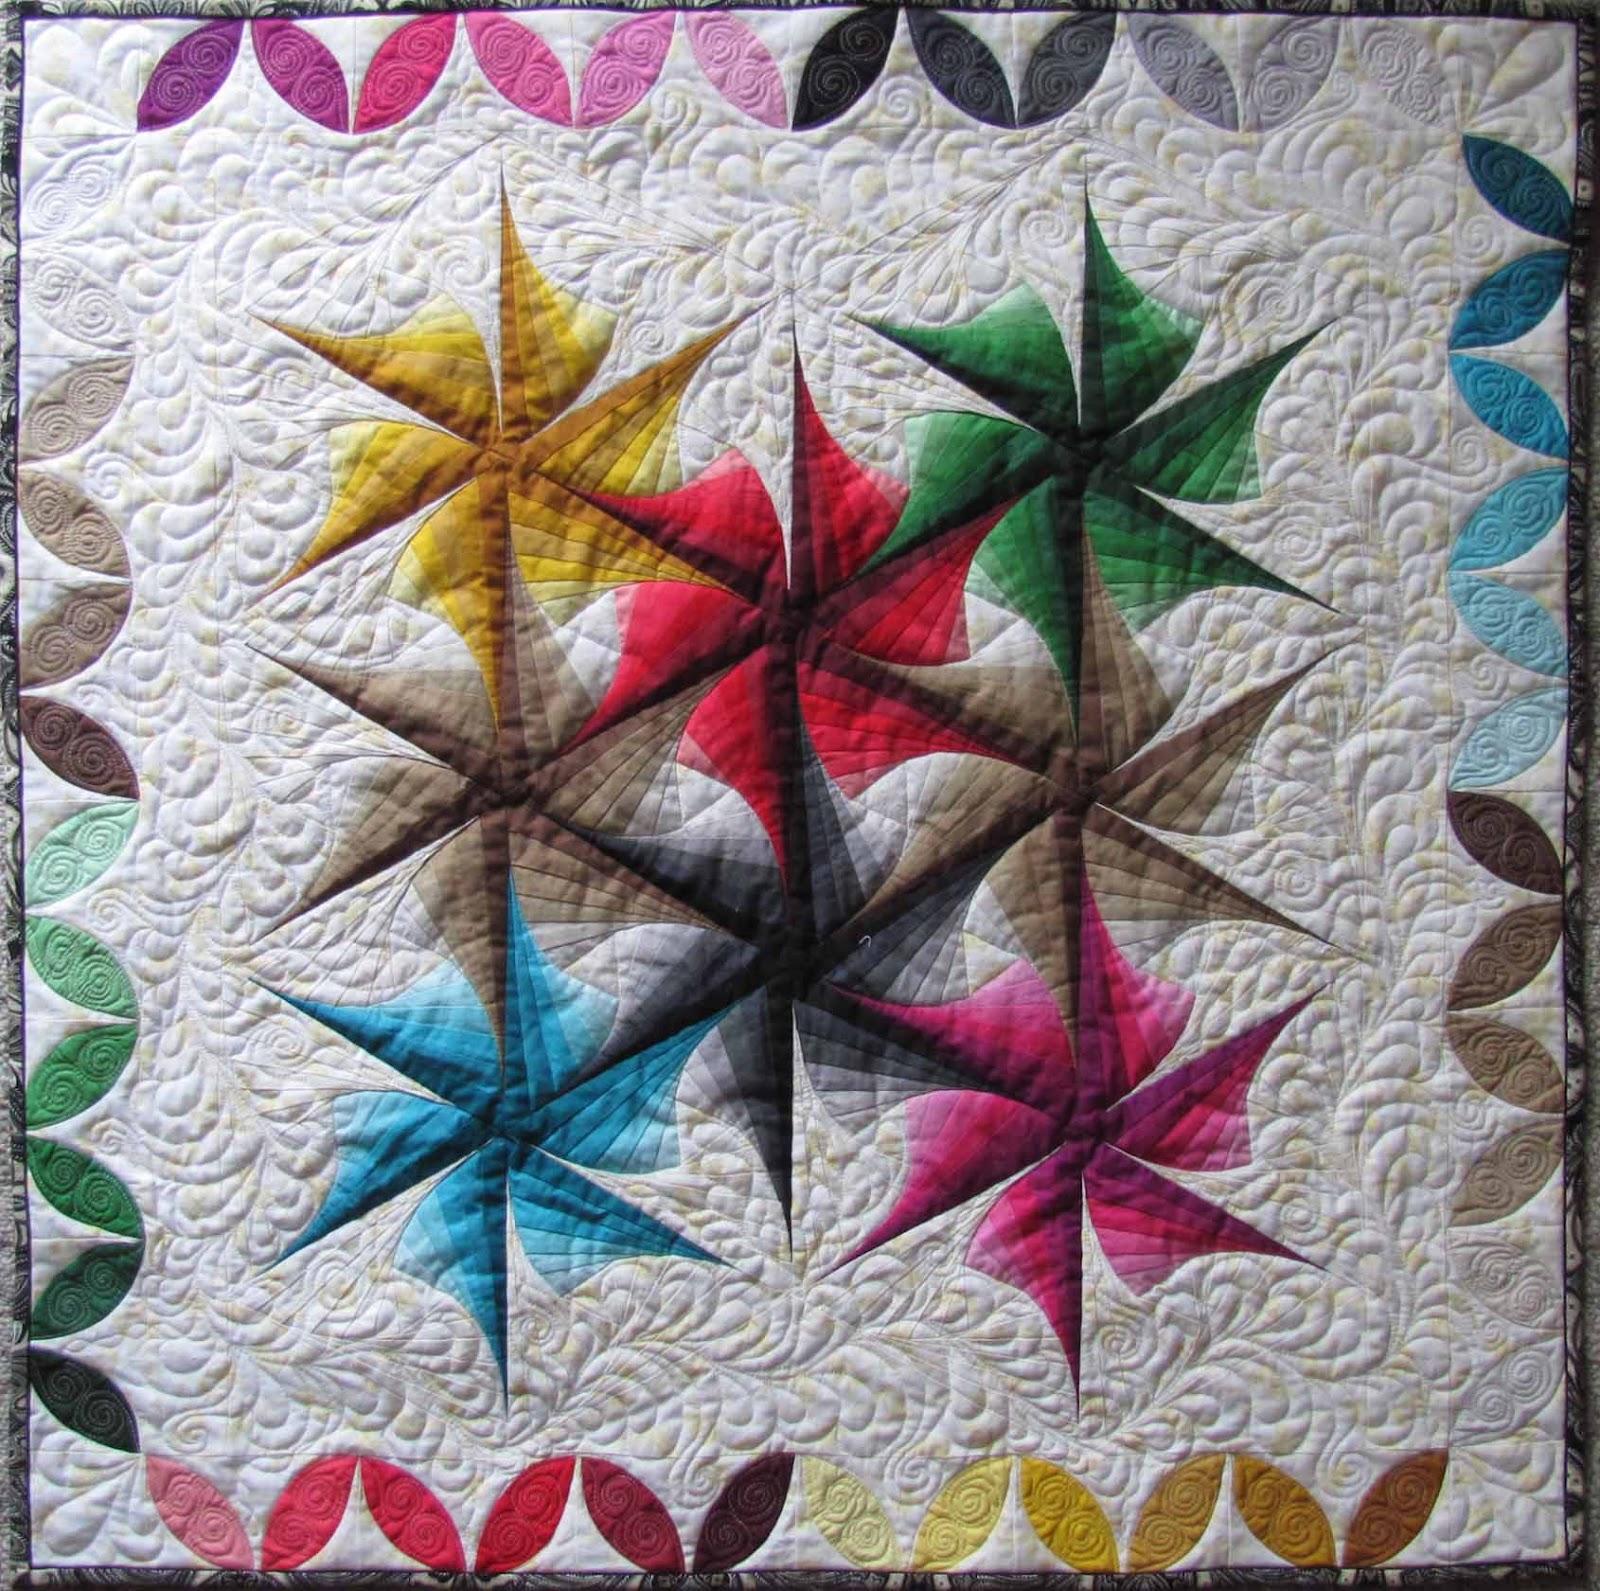 Quilt Pattern Log Cabin Twist : Quilts Patterns, Quilts Inspiration, Twists Quilts, Cabin Triangles, Triangles Twists, Quilts ...